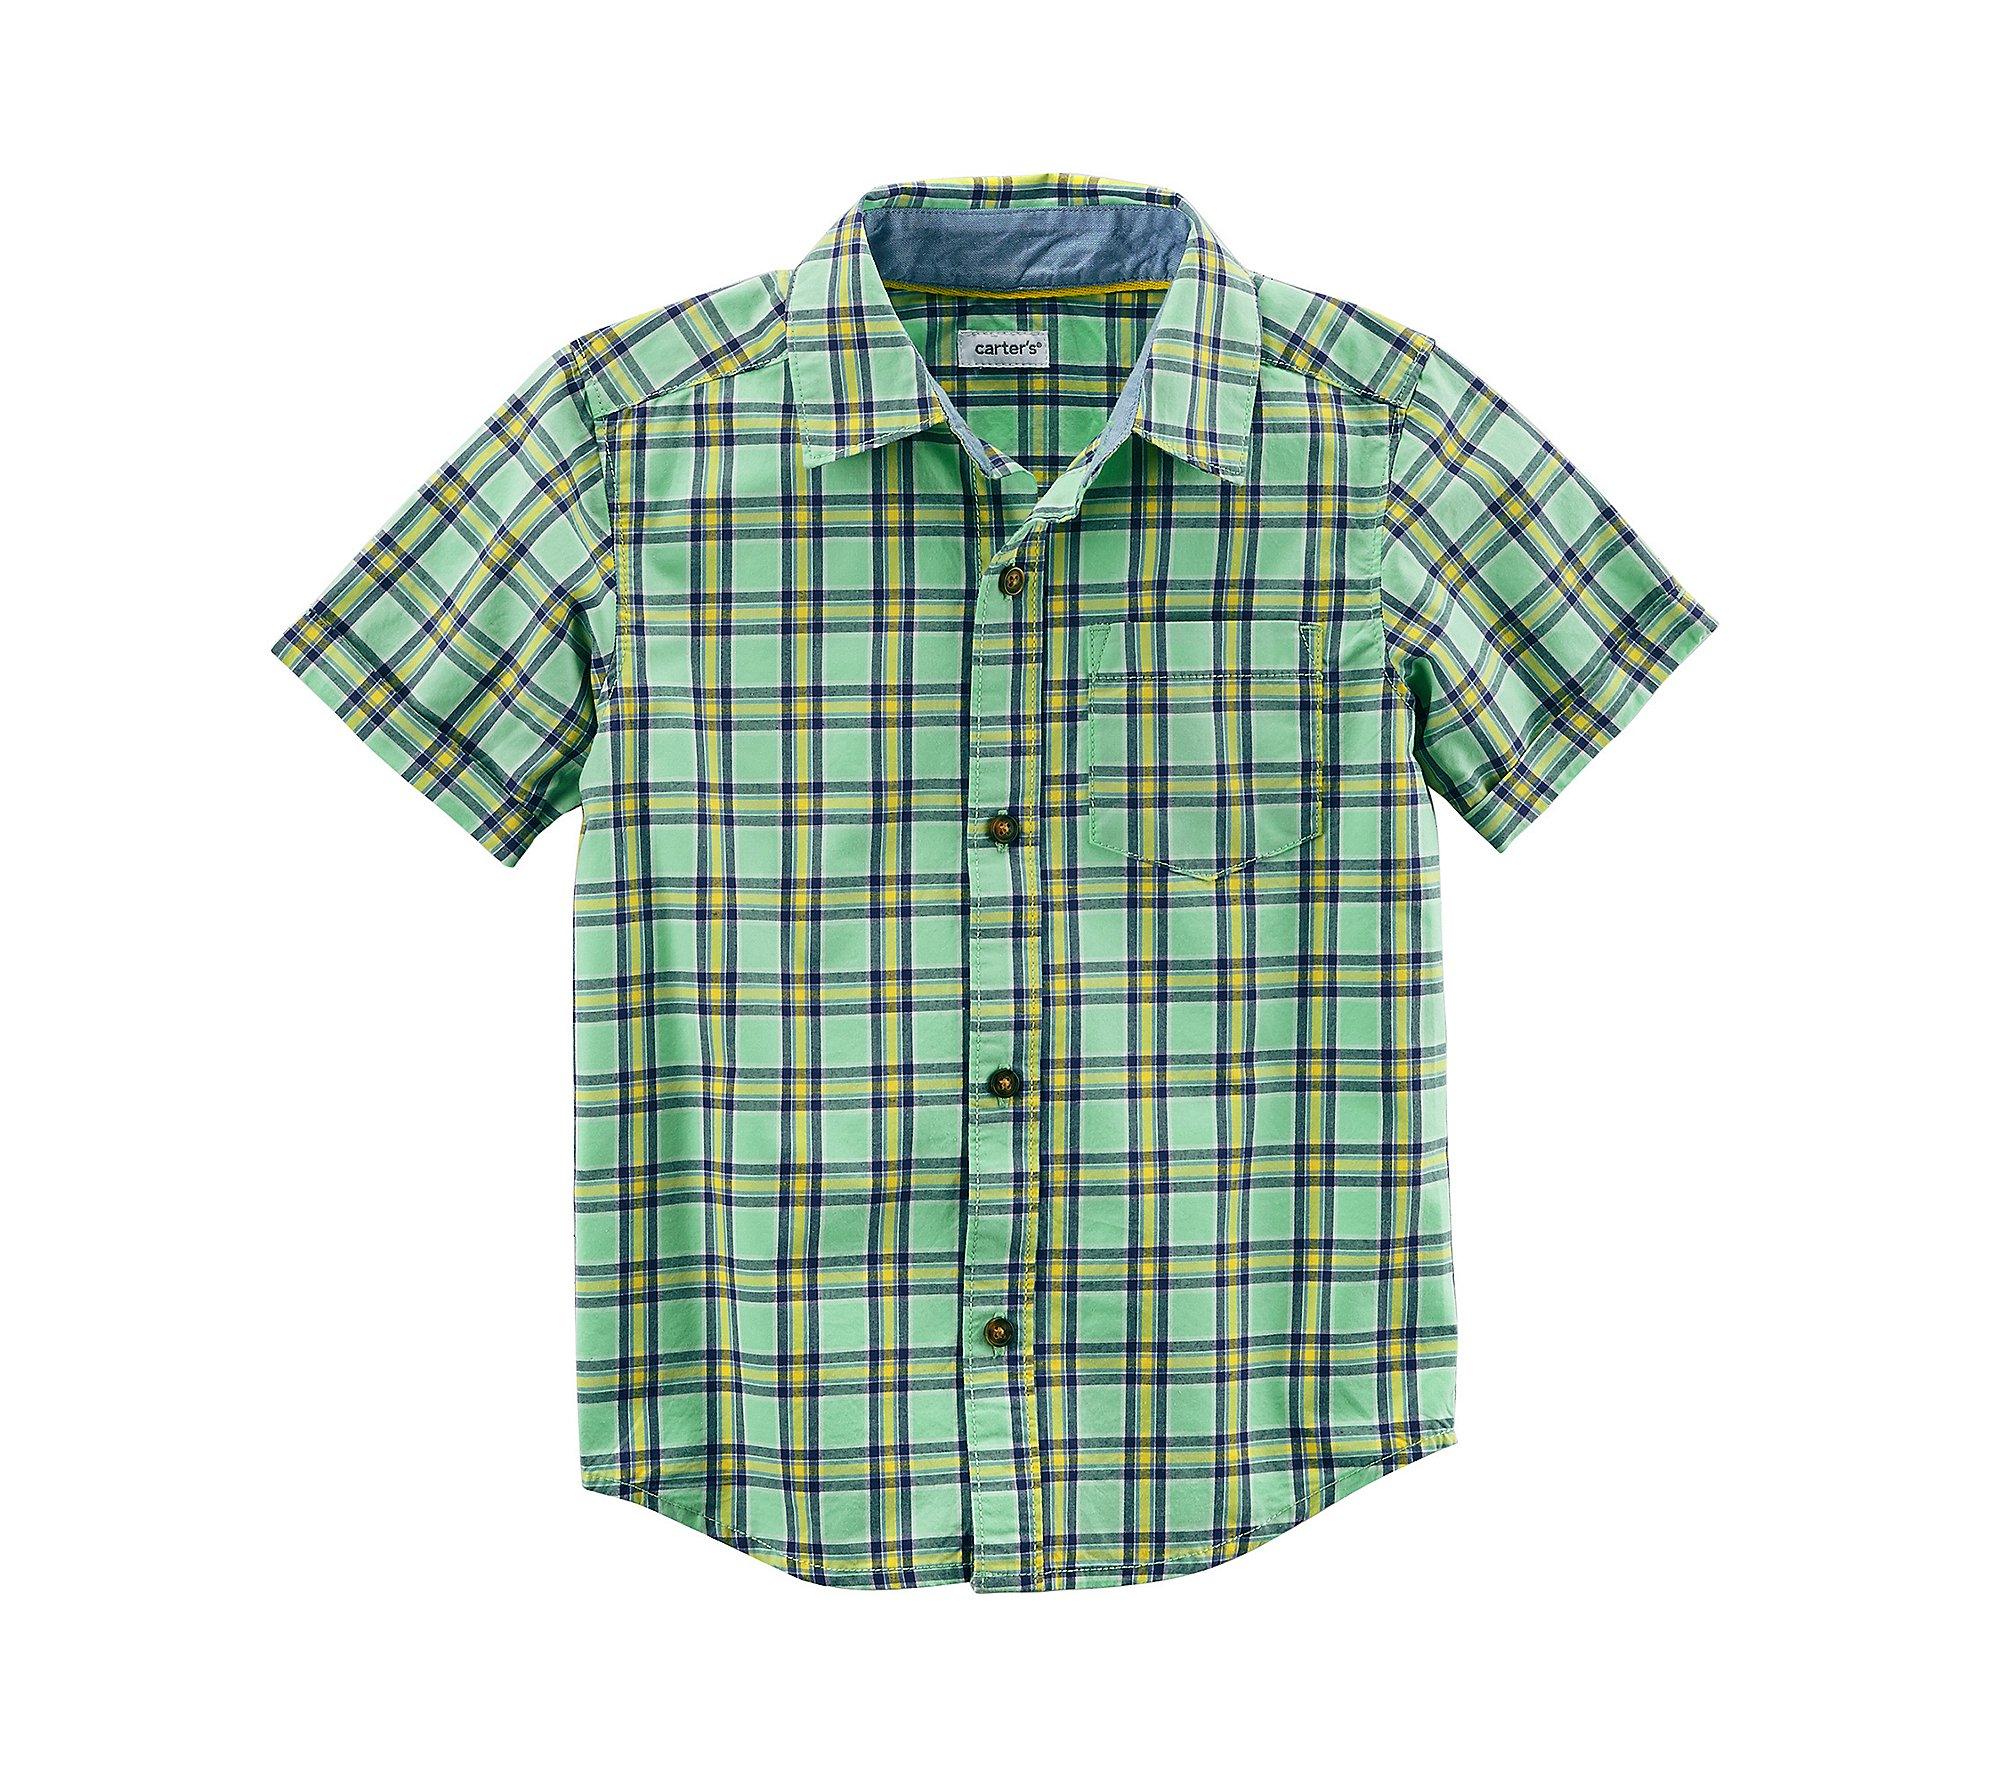 Carter's Boys' 2T-8 Short Sleeve Woven Plaid Button up Top 4-5